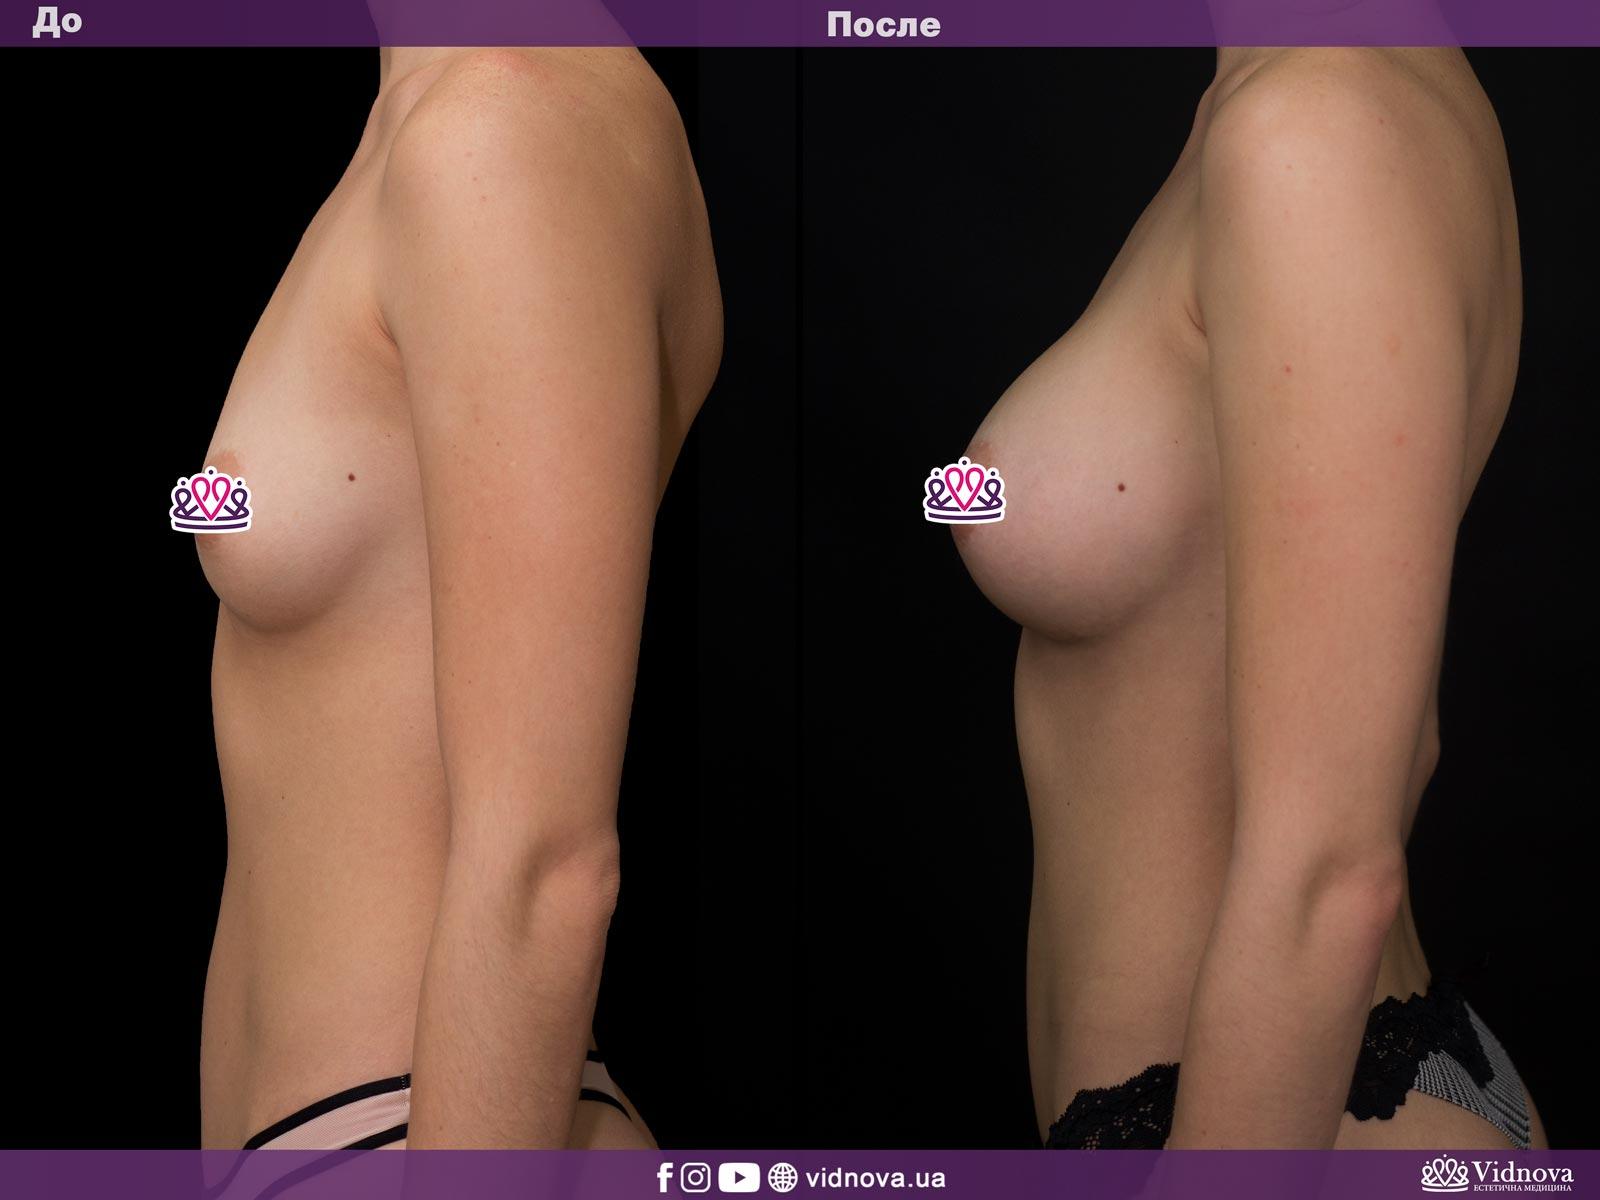 Увеличение груди: Фото ДО и ПОСЛЕ - Пример №3-3 - Клиника Vidnova